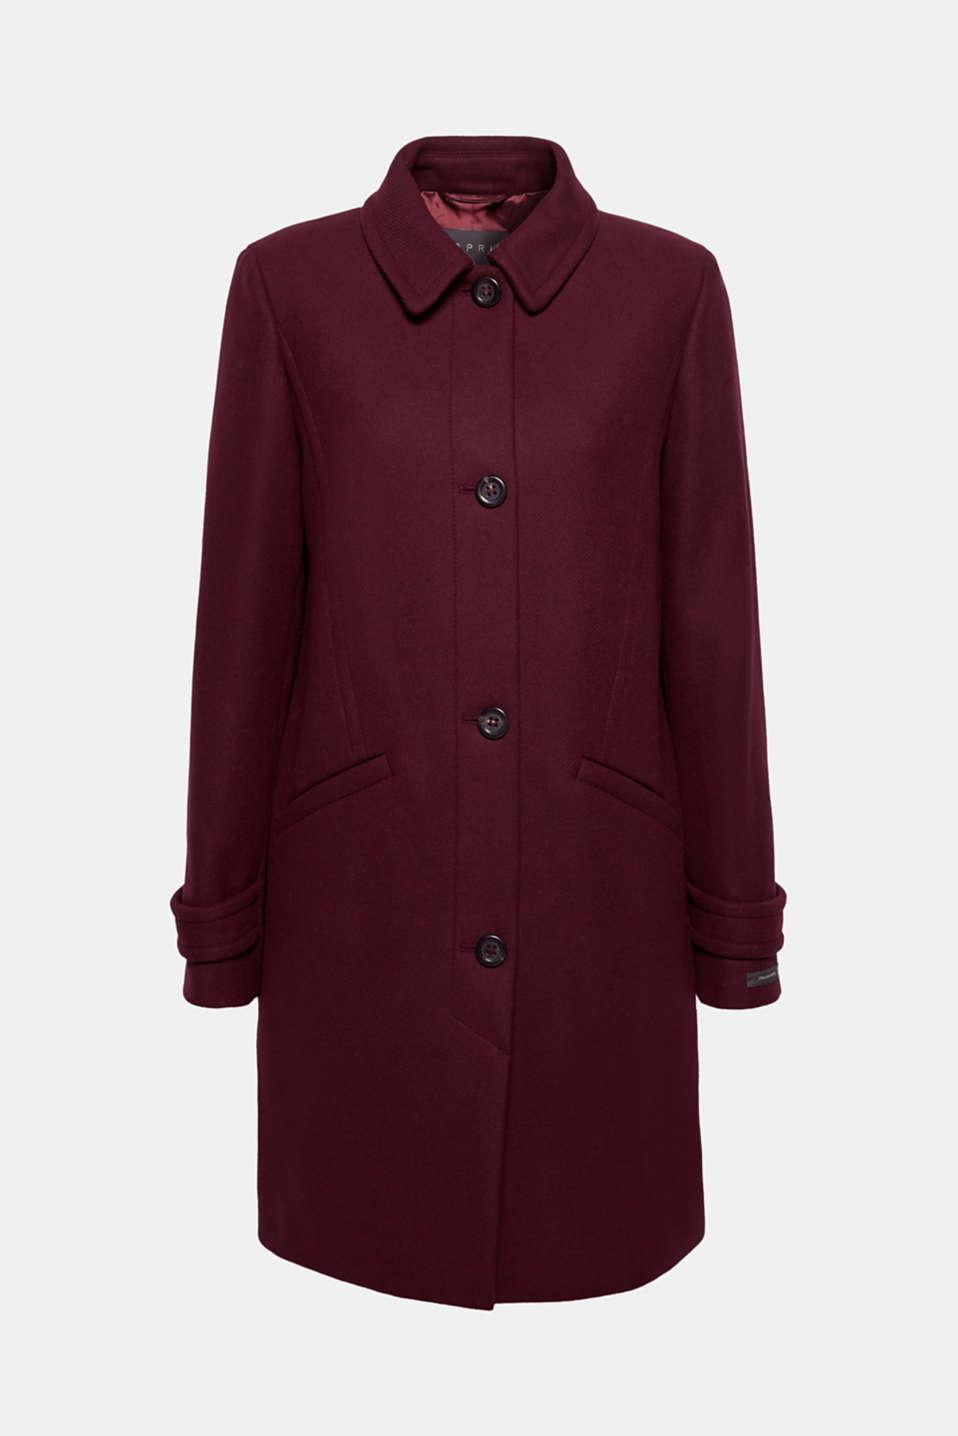 Wool blend coat, BORDEAUX RED, detail image number 8